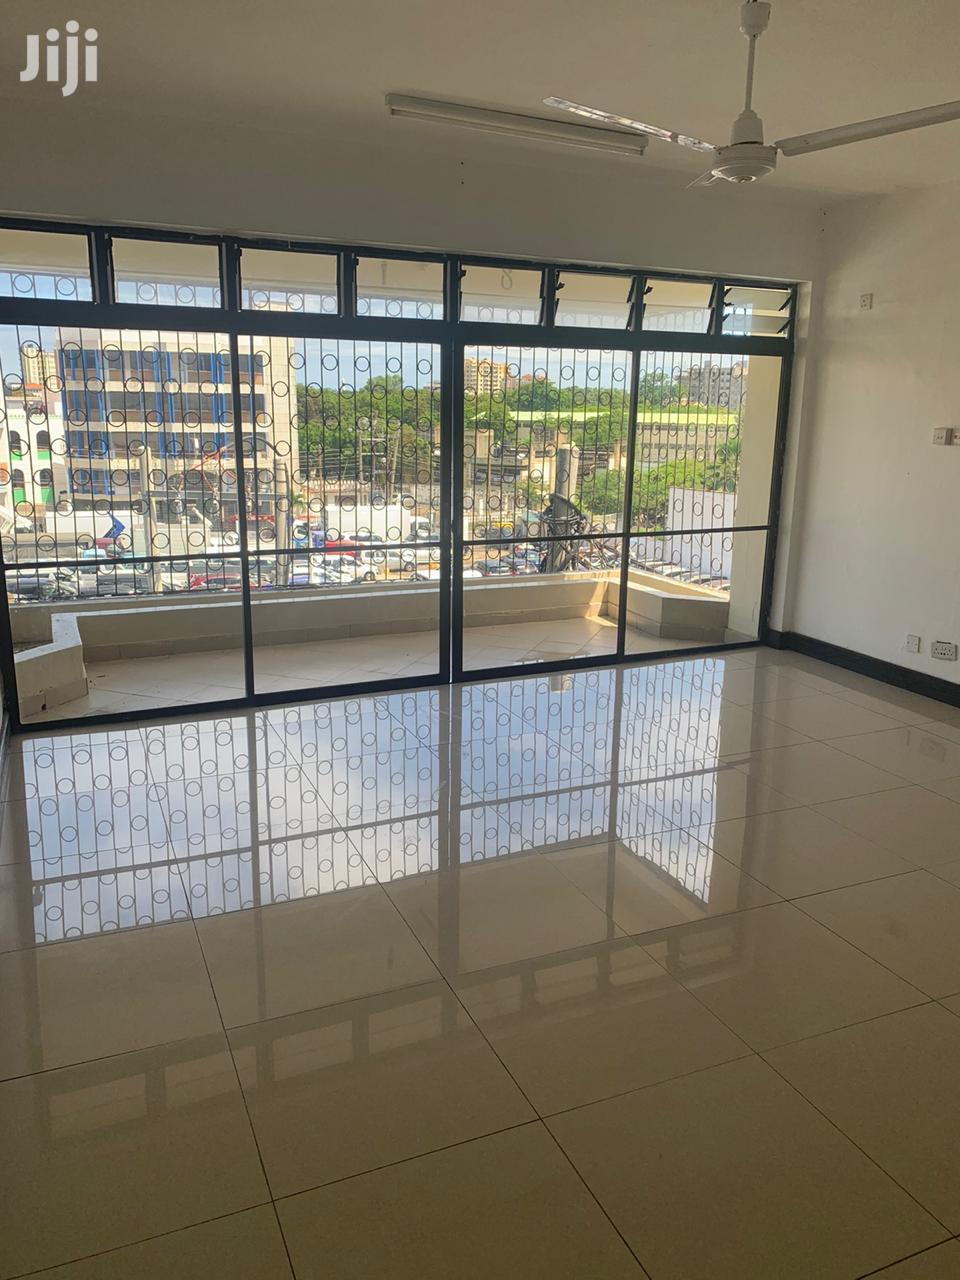 4 Bedron Apartment Kizingo